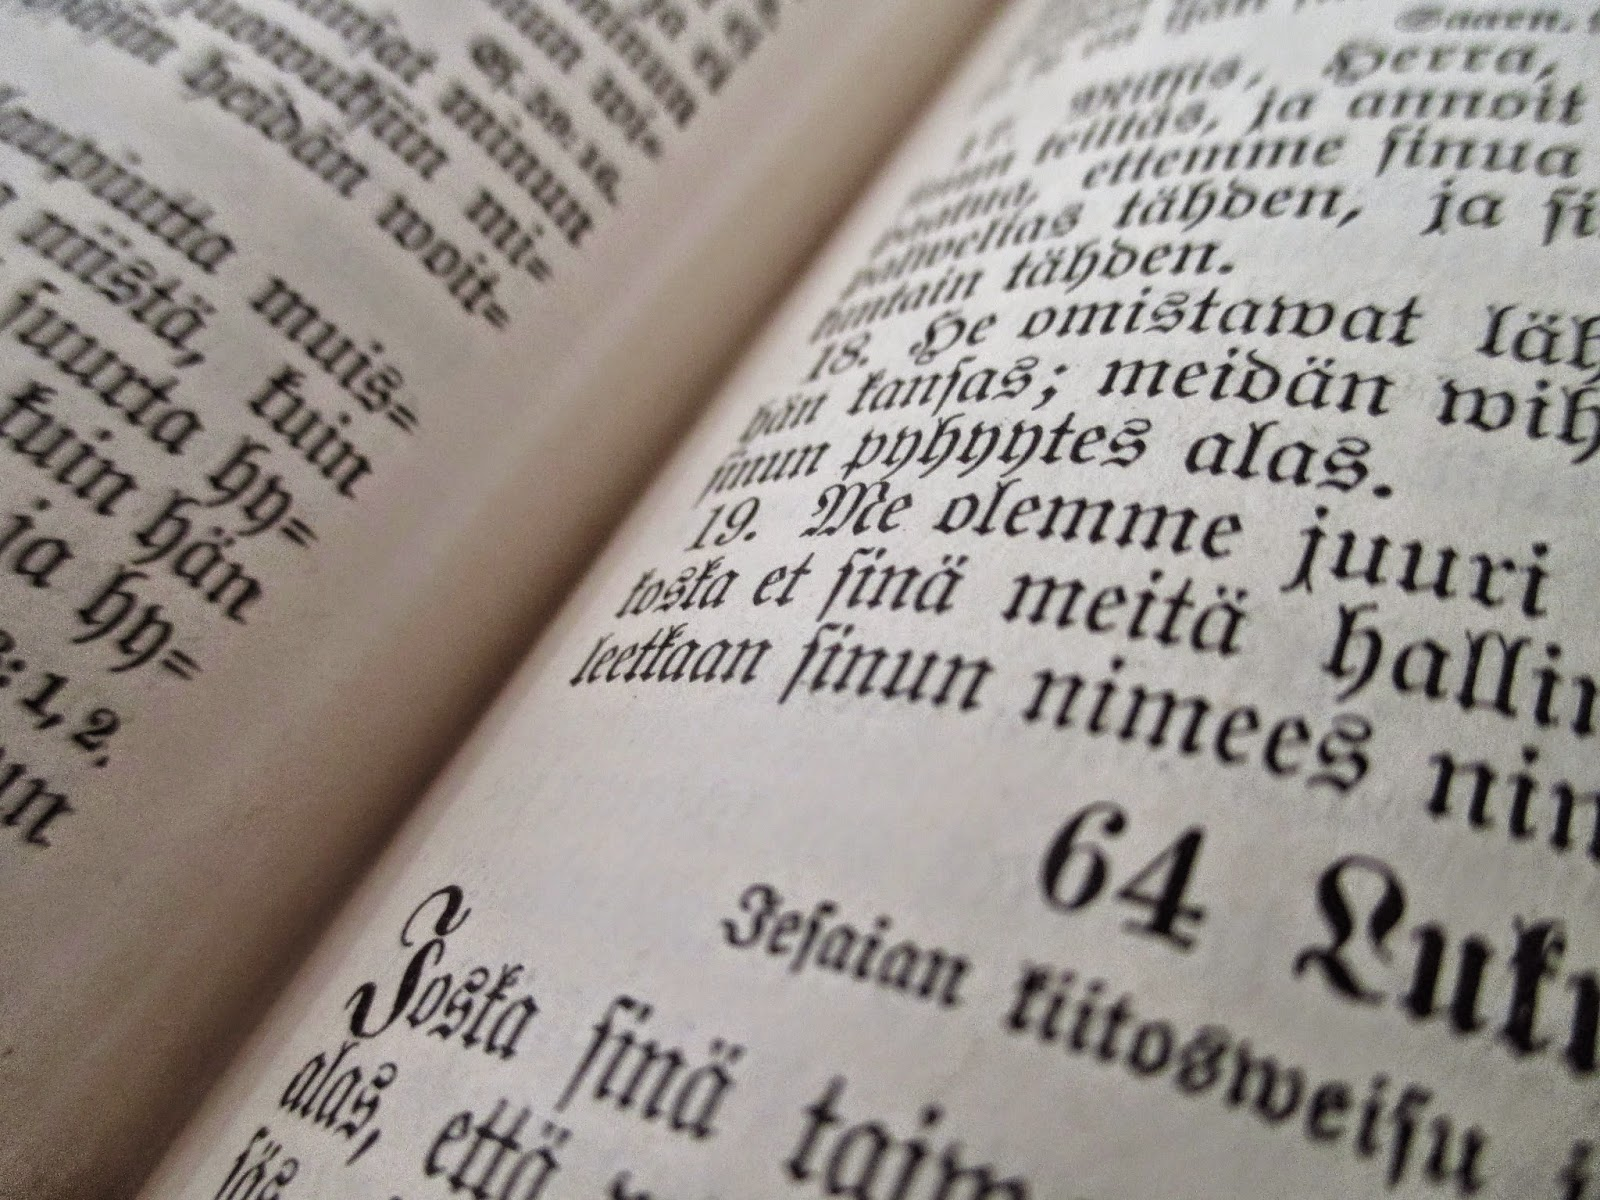 Biblia, vanha teksti,